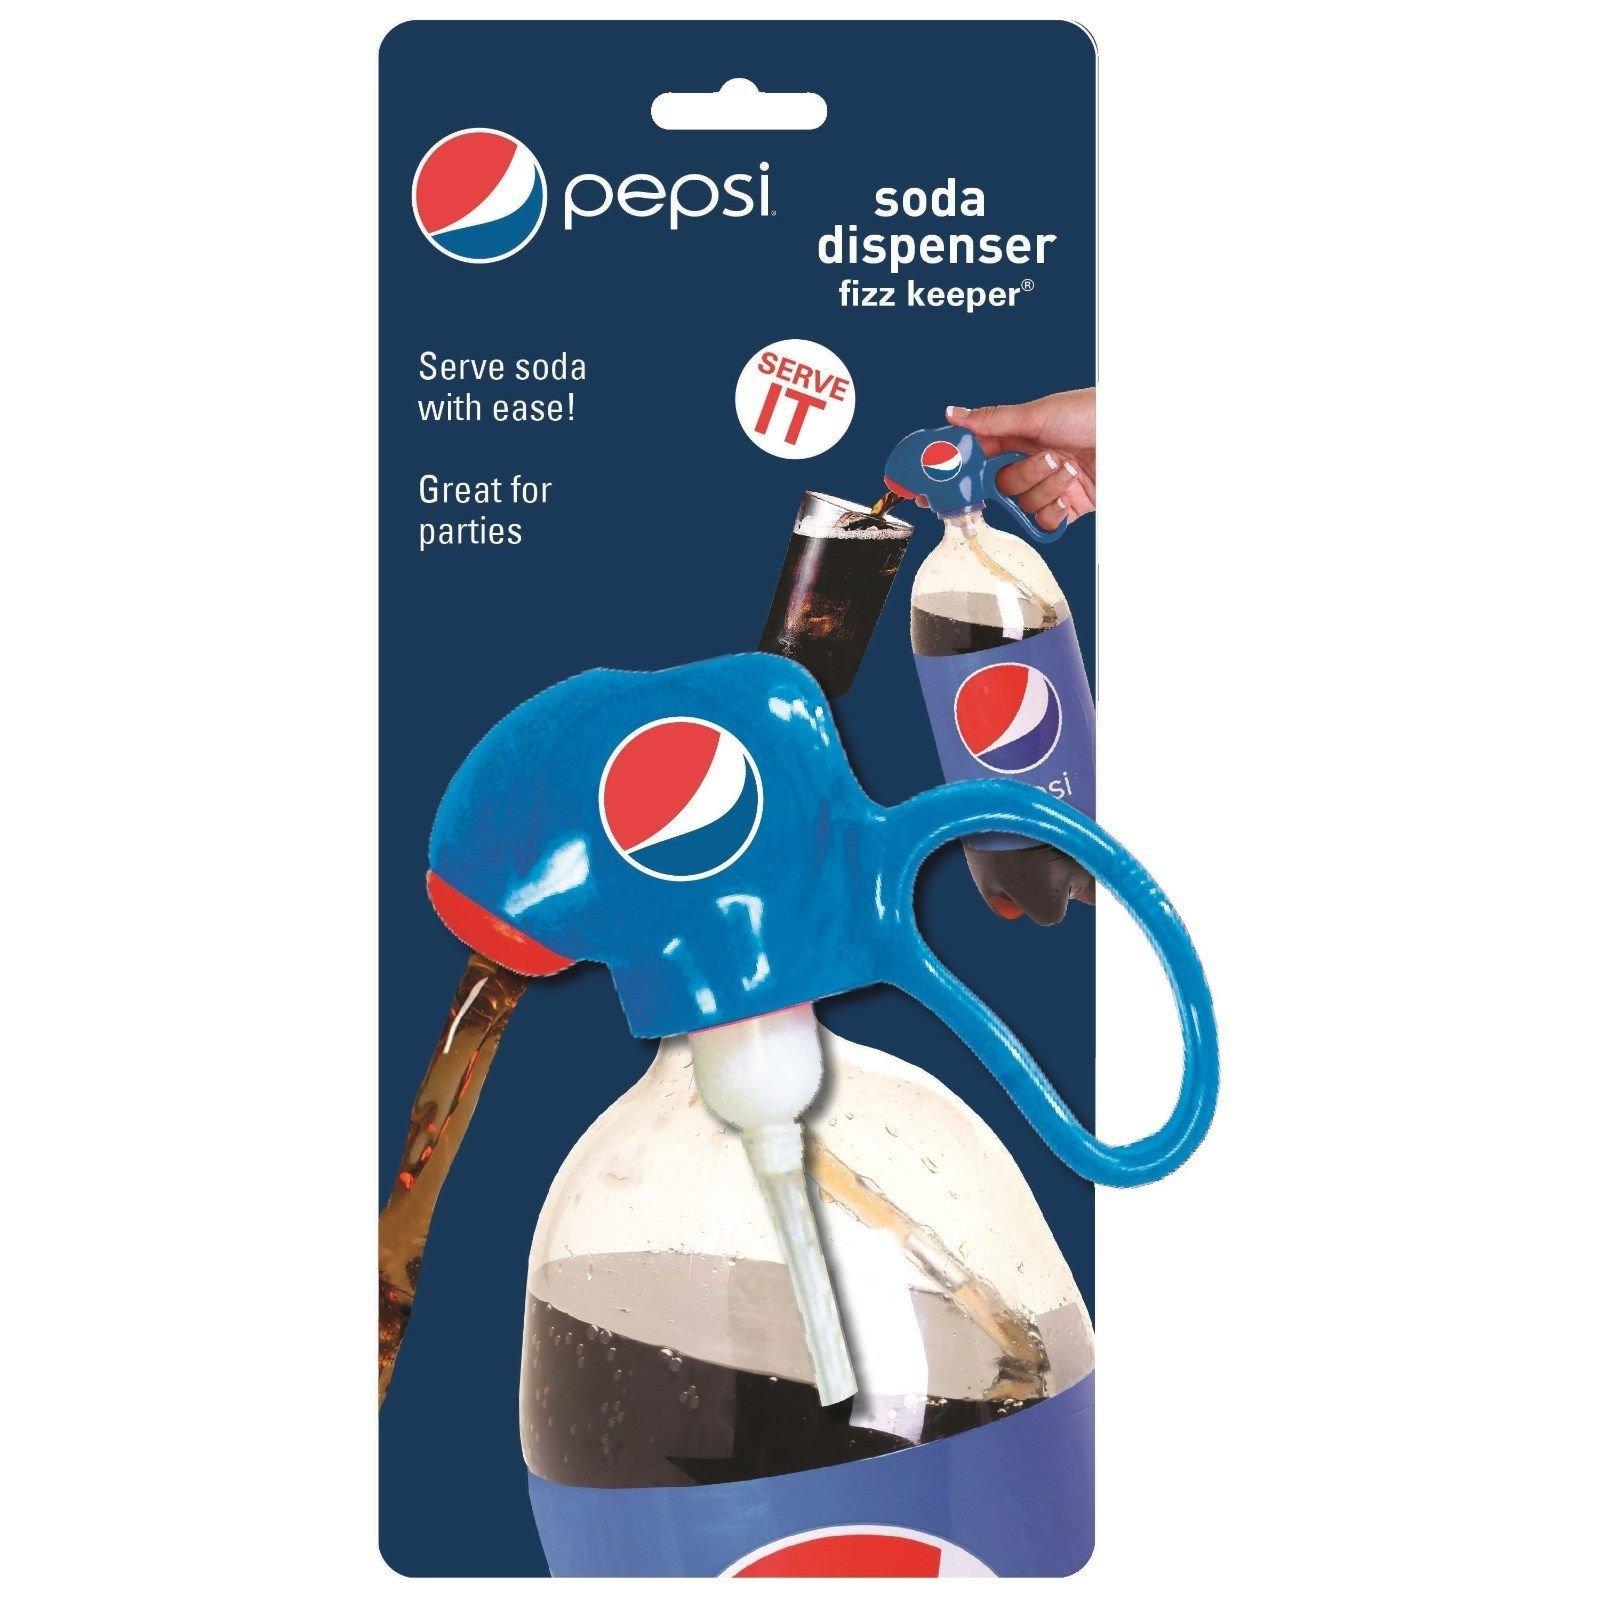 Jokari Pepsi Modern Logo Fizz Keeper Soda Dispenser